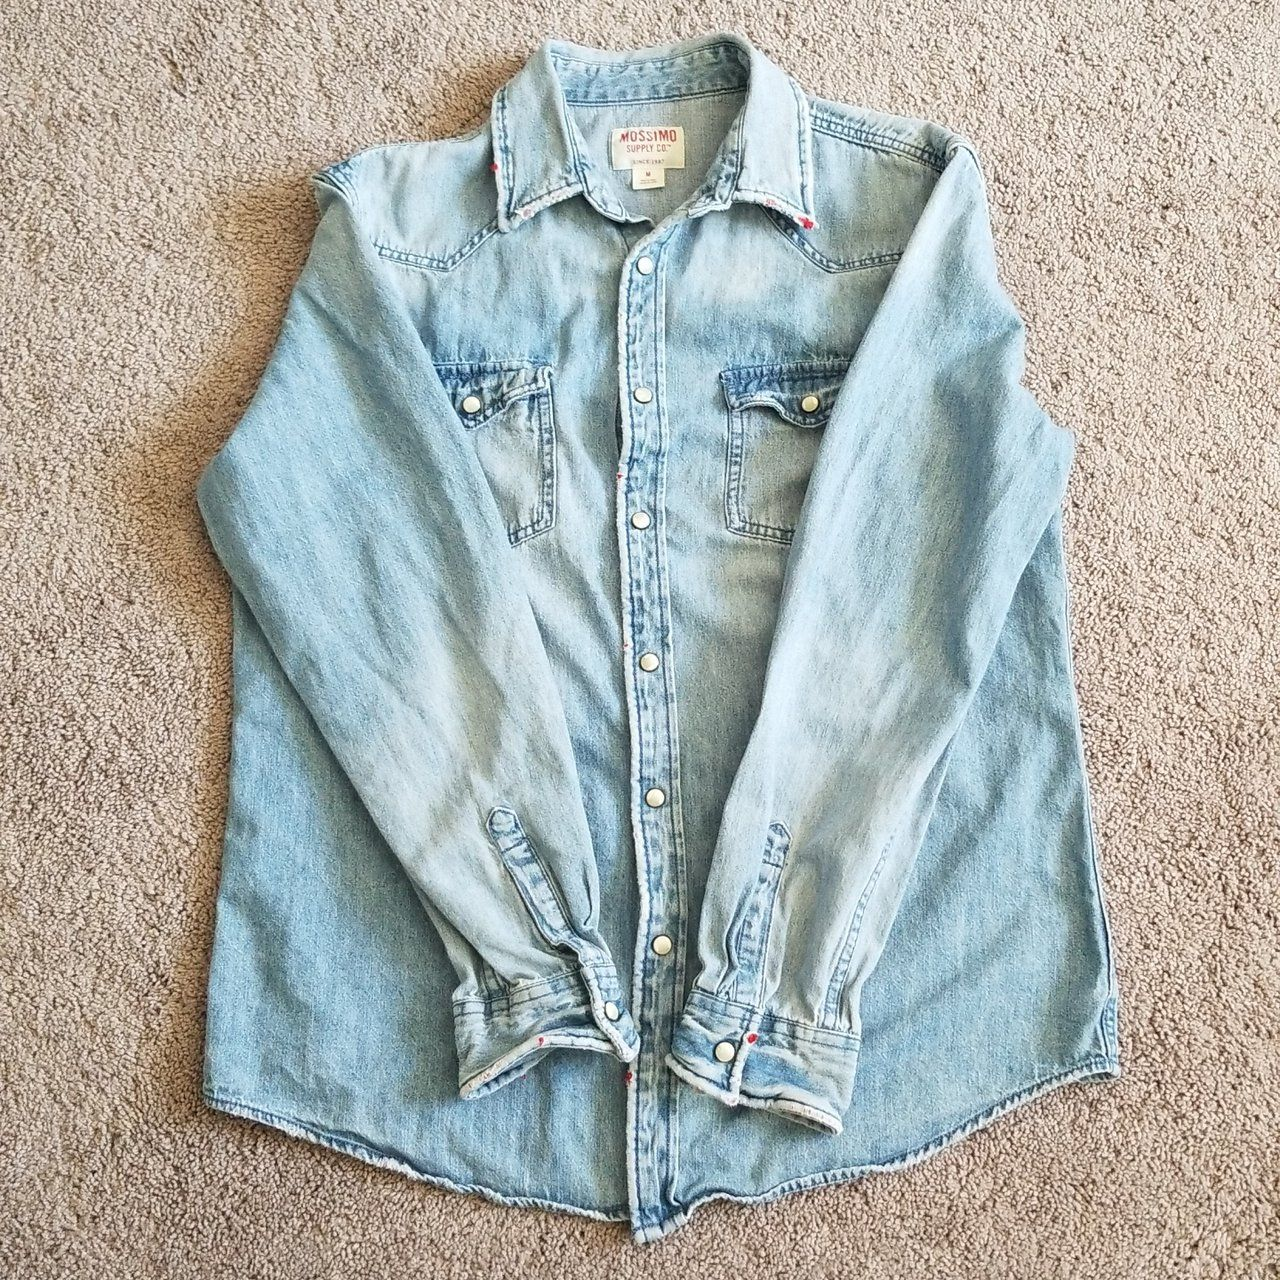 Mossimo light blue denim jacket